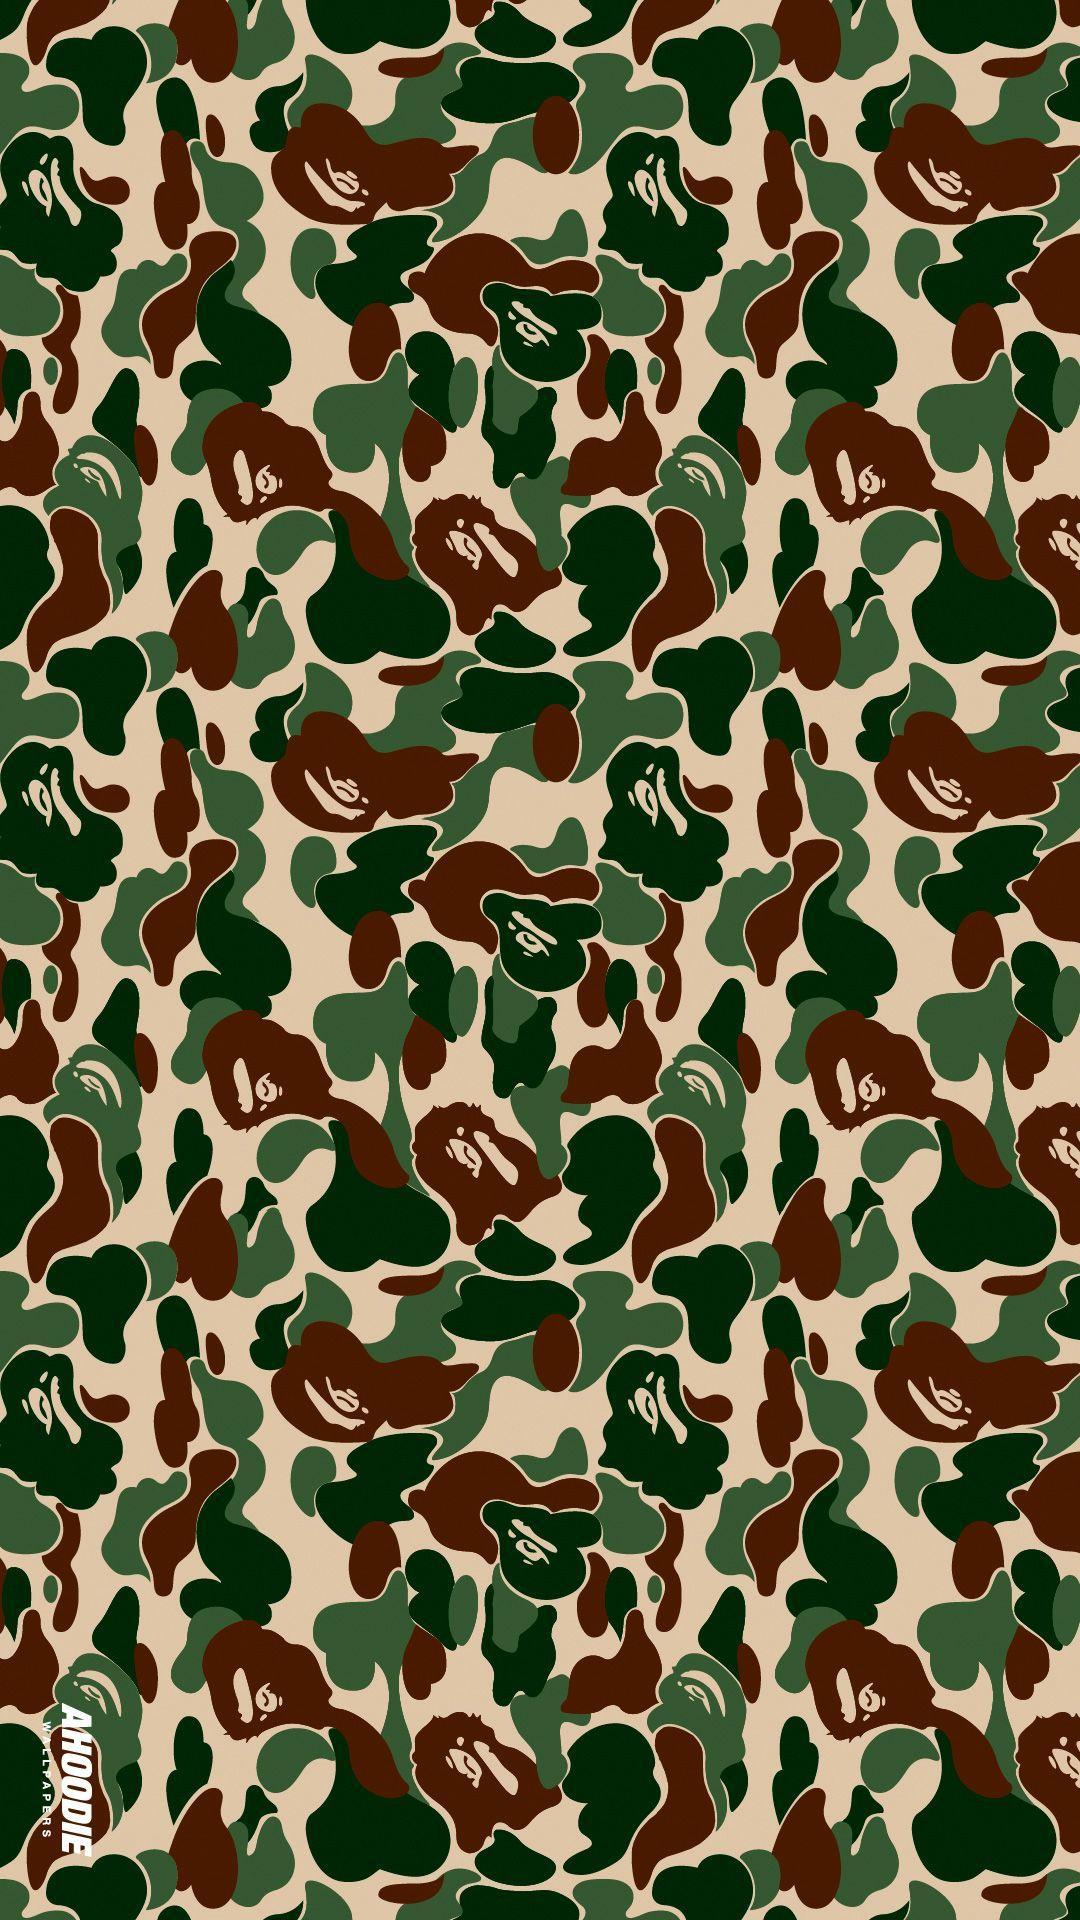 Bape Camo Wallpapers Top Free Bape Camo Backgrounds Wallpaperaccess